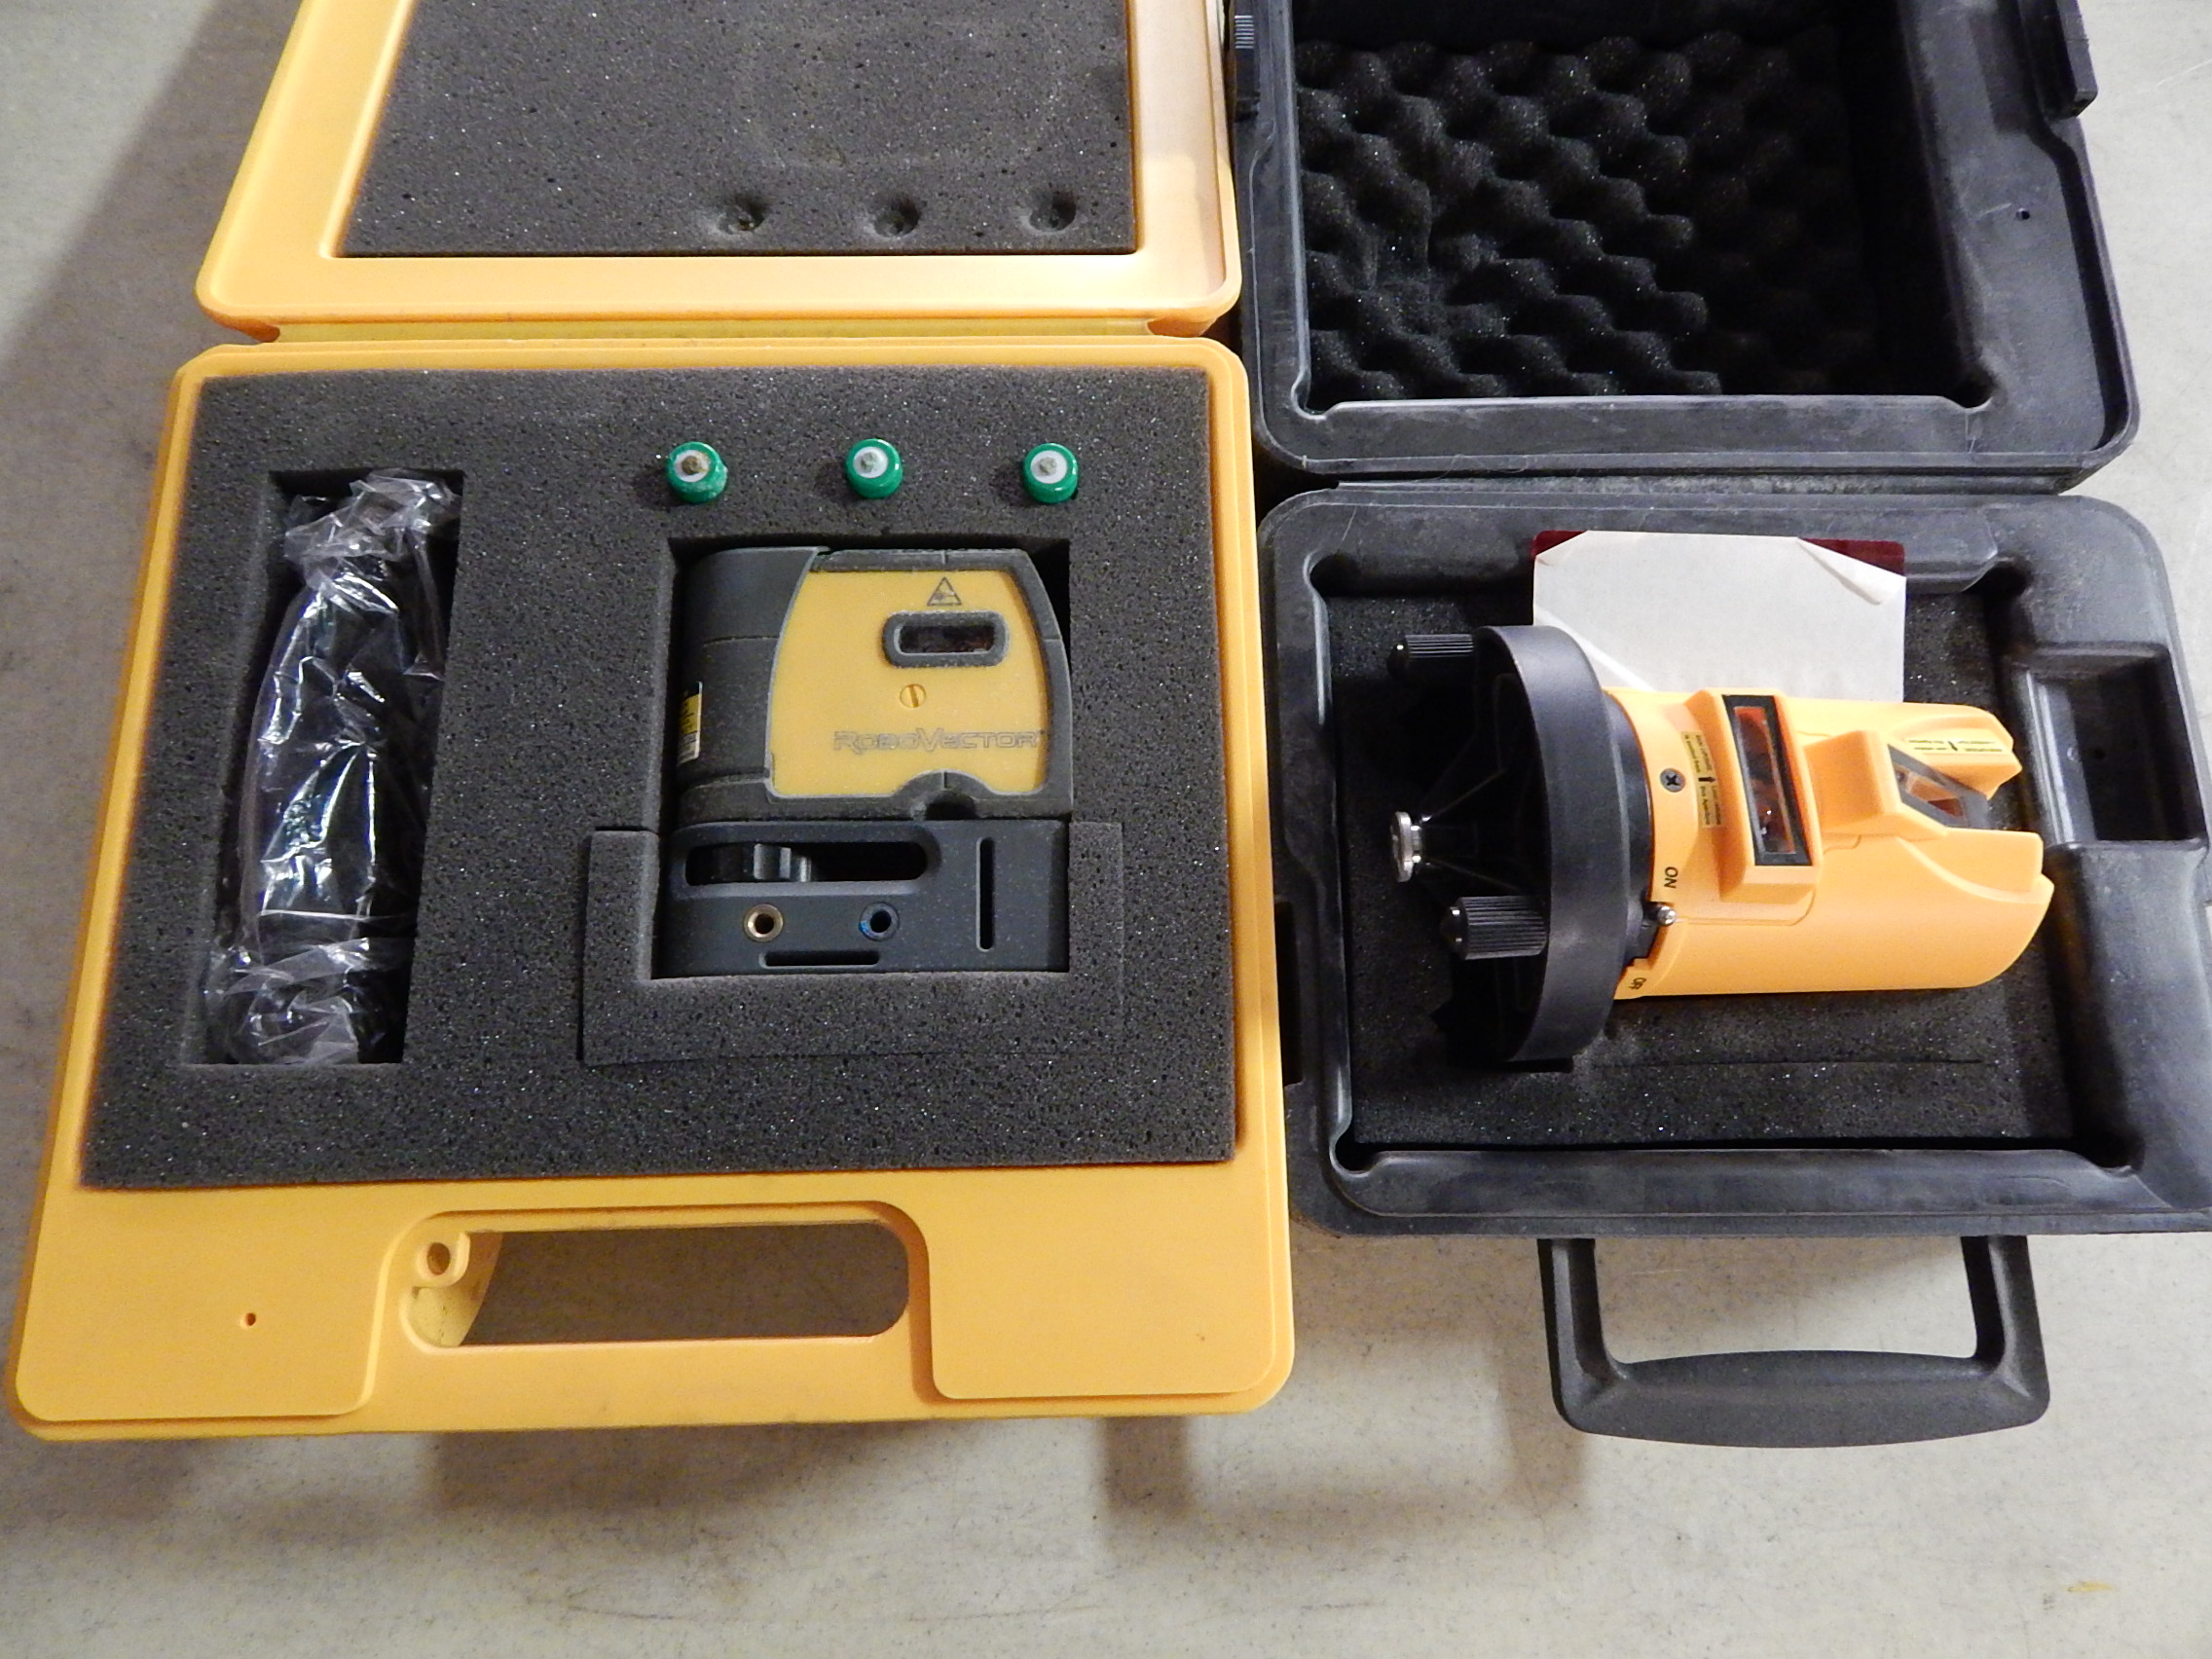 Lot 3 - E-Z Read Cross Shot Laser Level and Robo Vector Laser Level